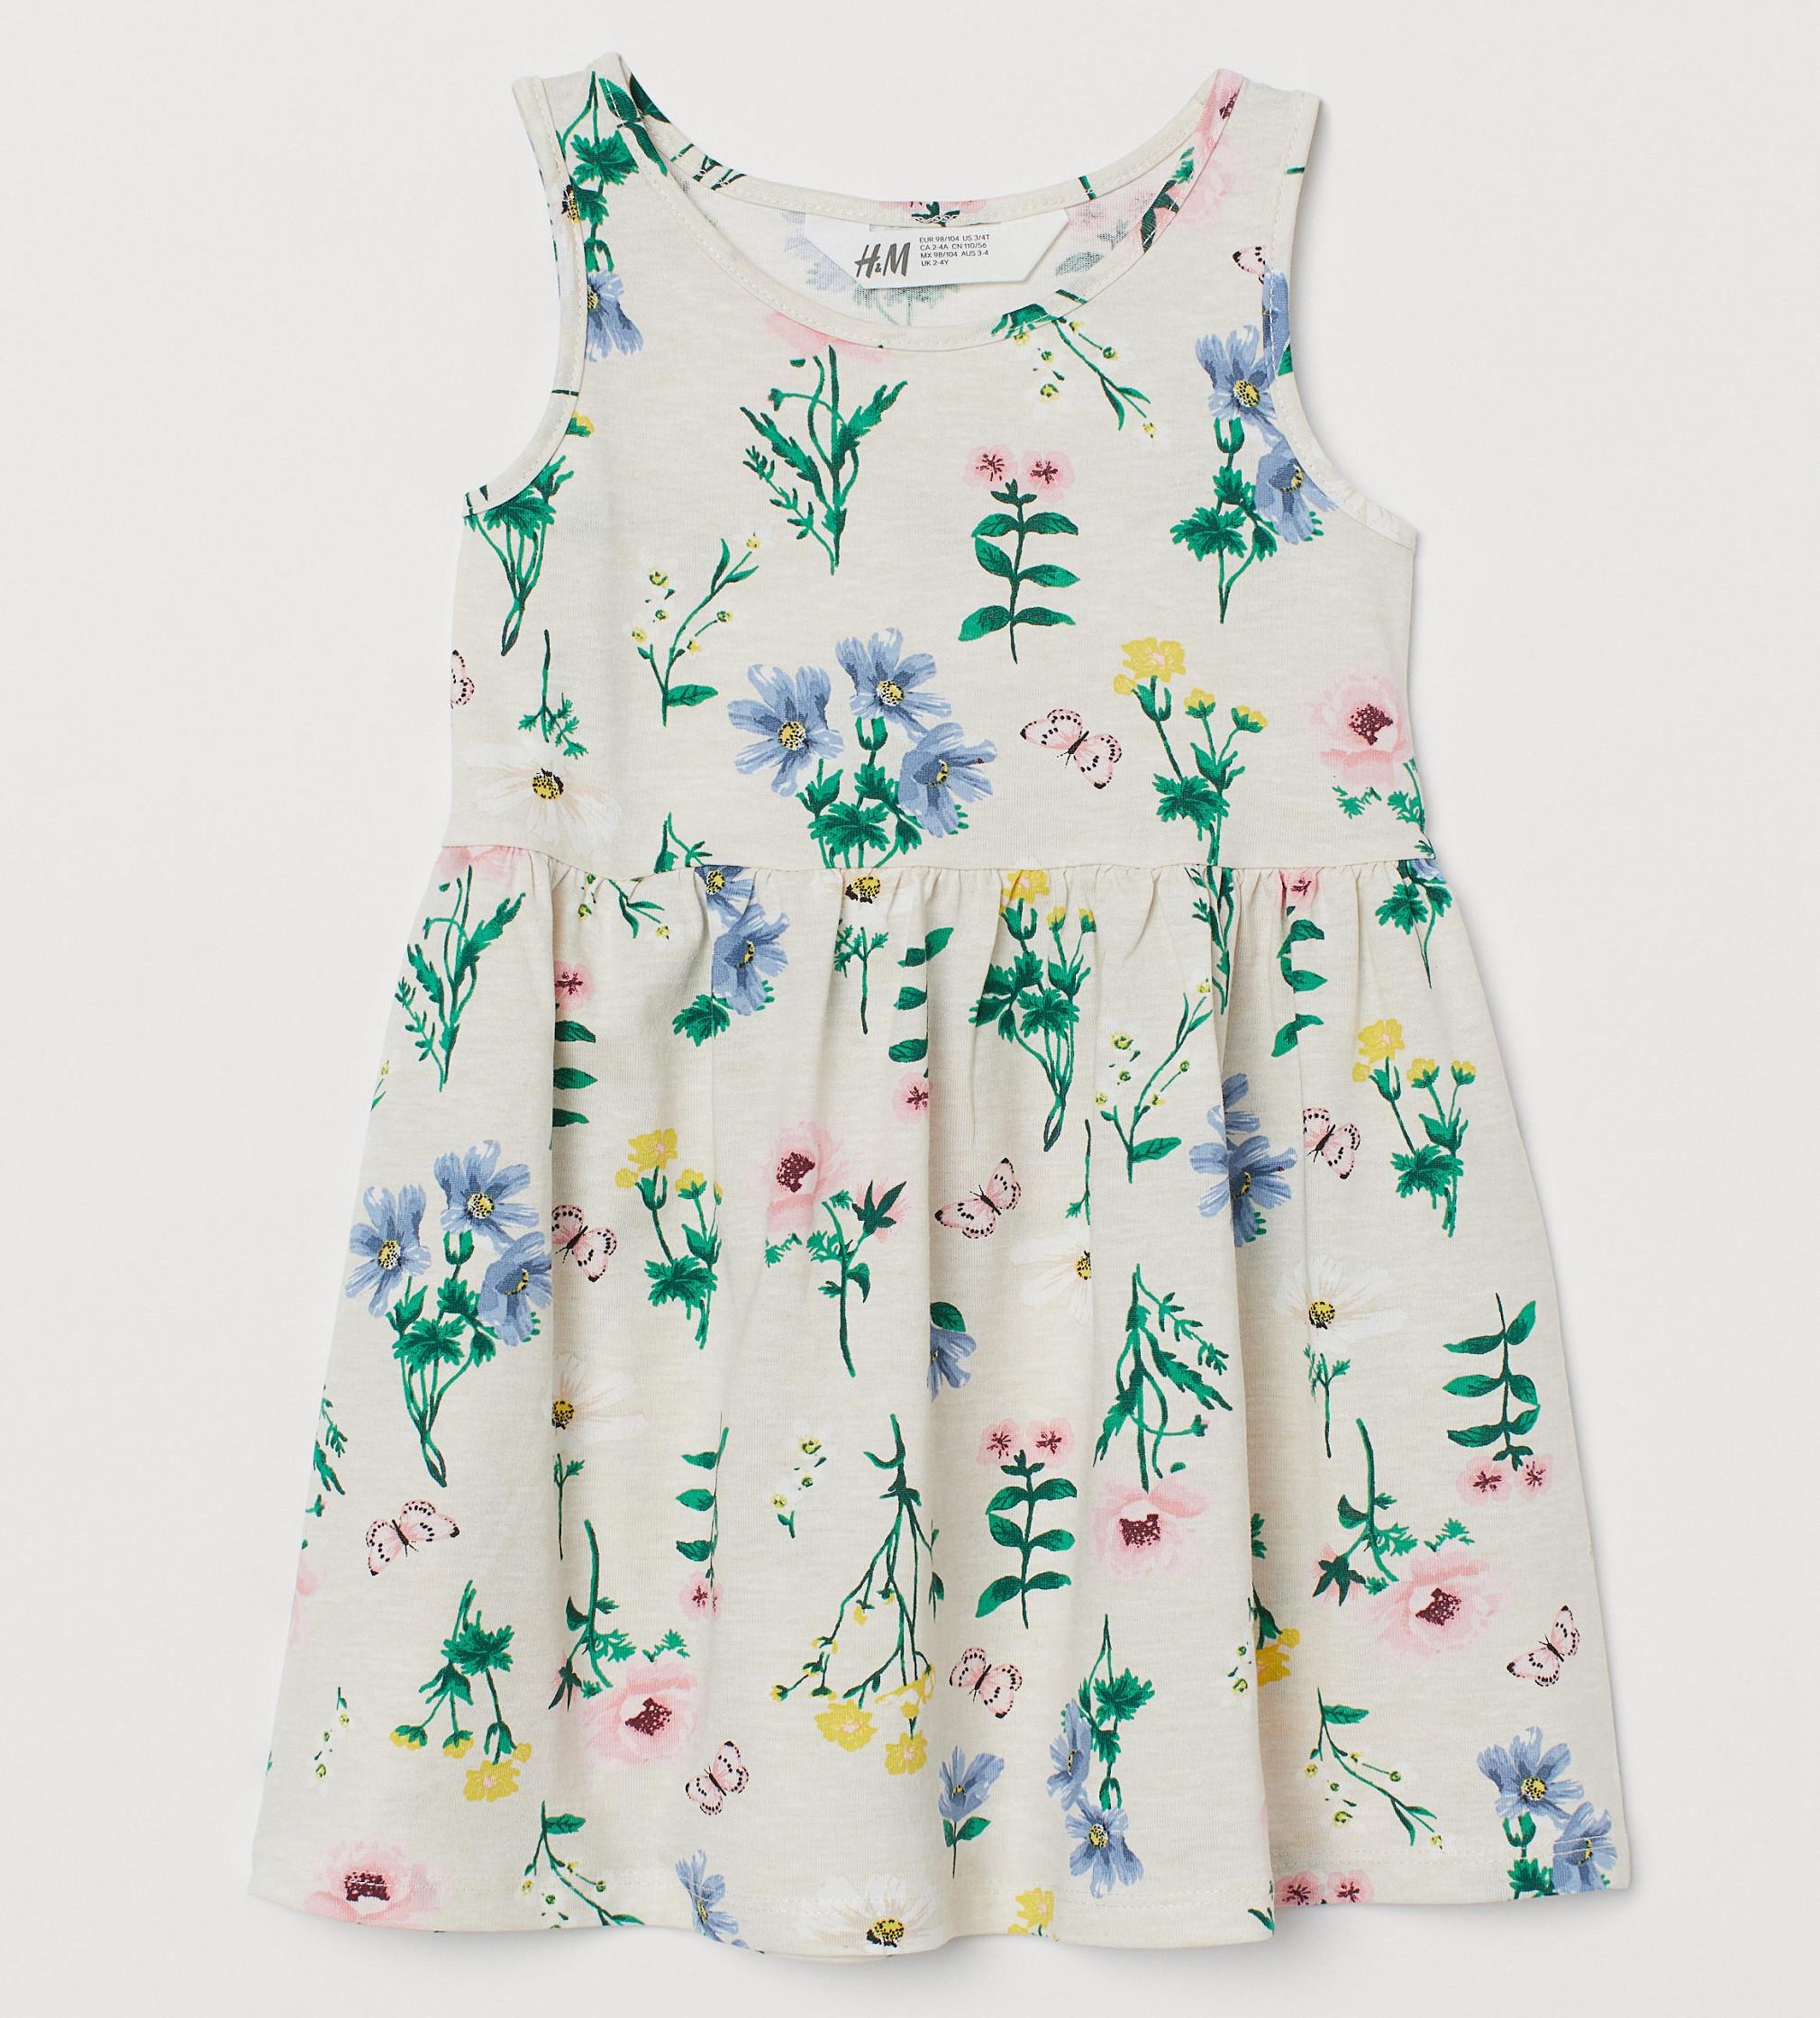 Купити Сарафан H&M NATURAL WHITE/FLORAL - фото 1